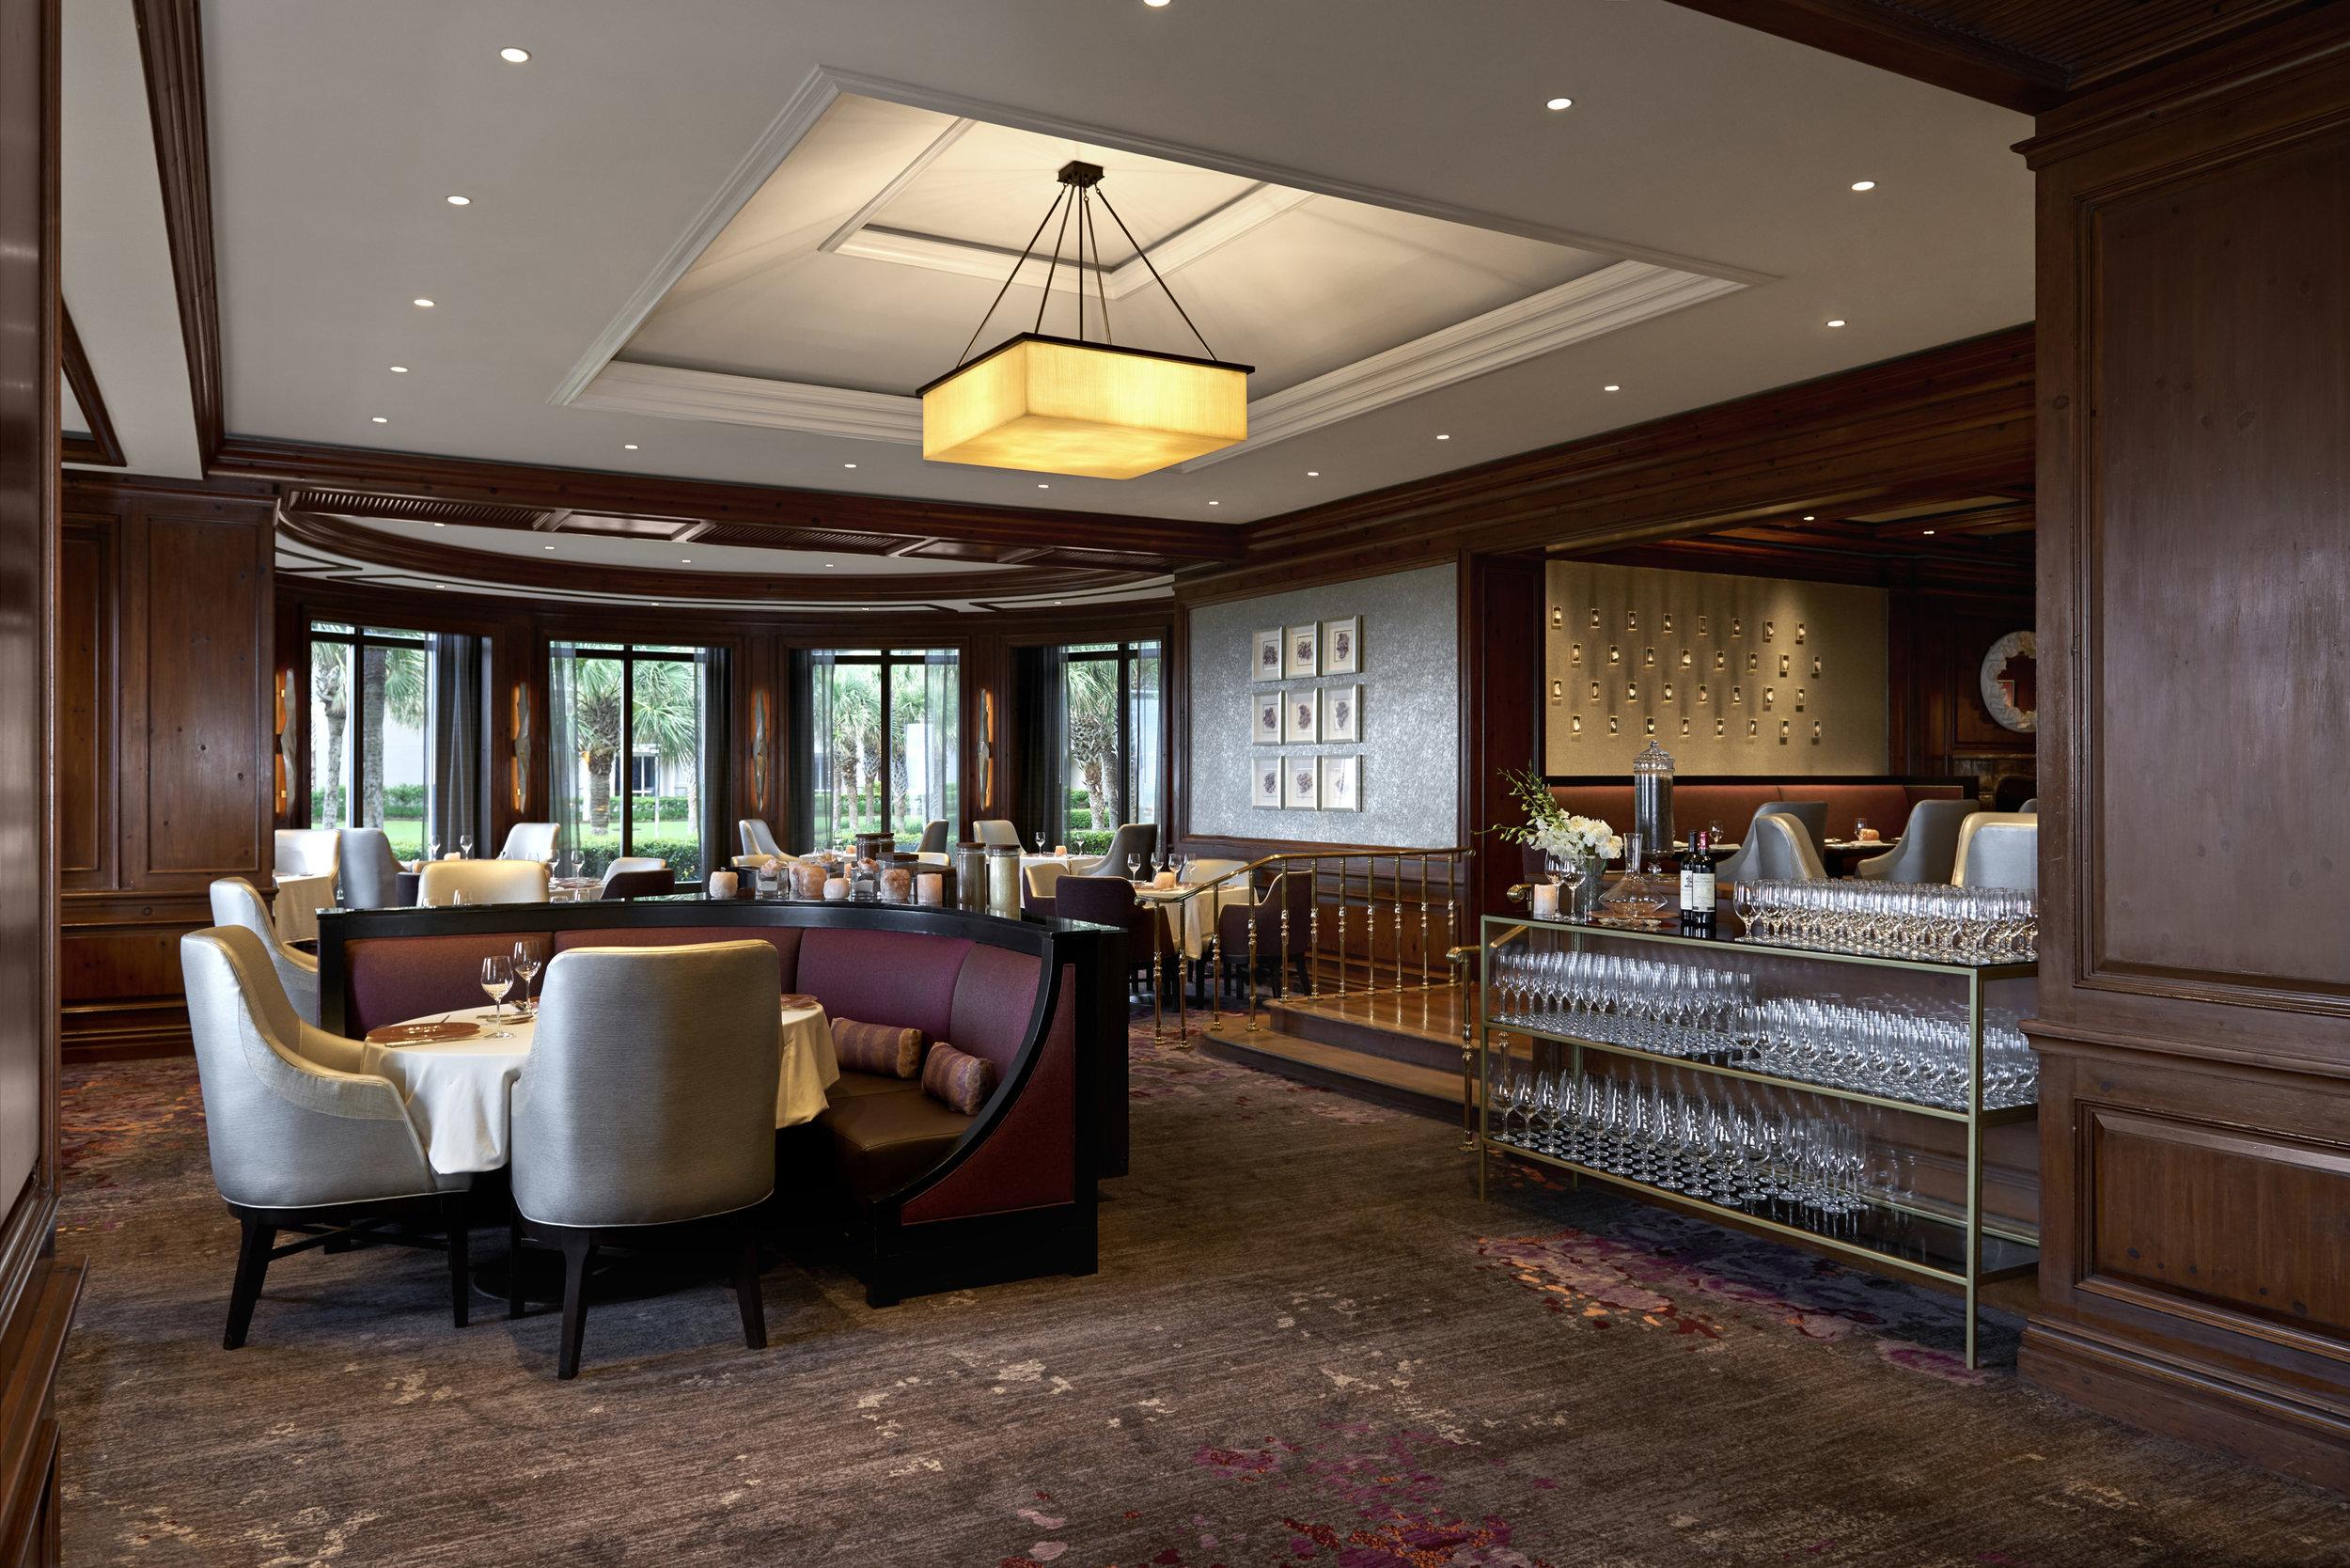 Ritz-Carlton-Amelia-Island-SHot-27-No-People-LR.jpg